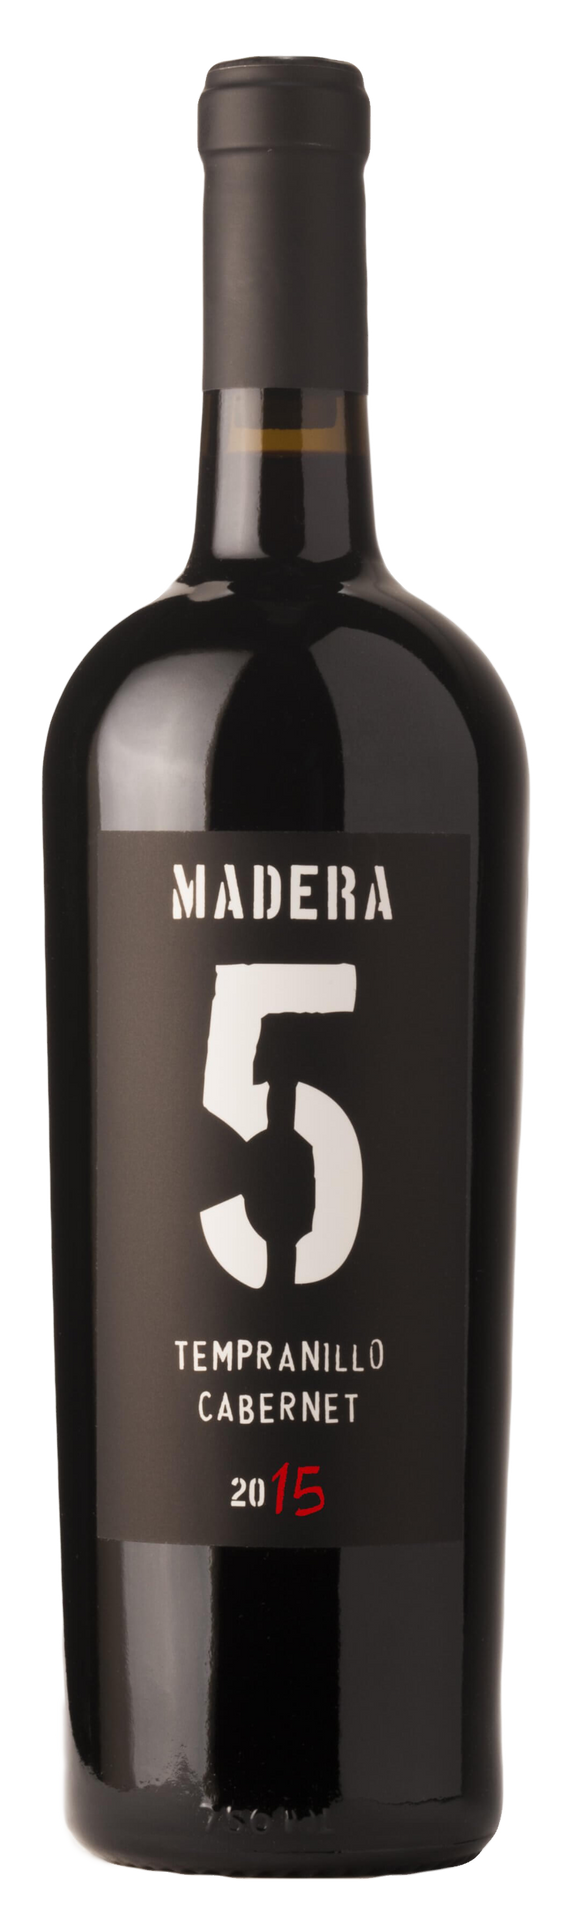 Madera 5 Tempranillo/Cabernet